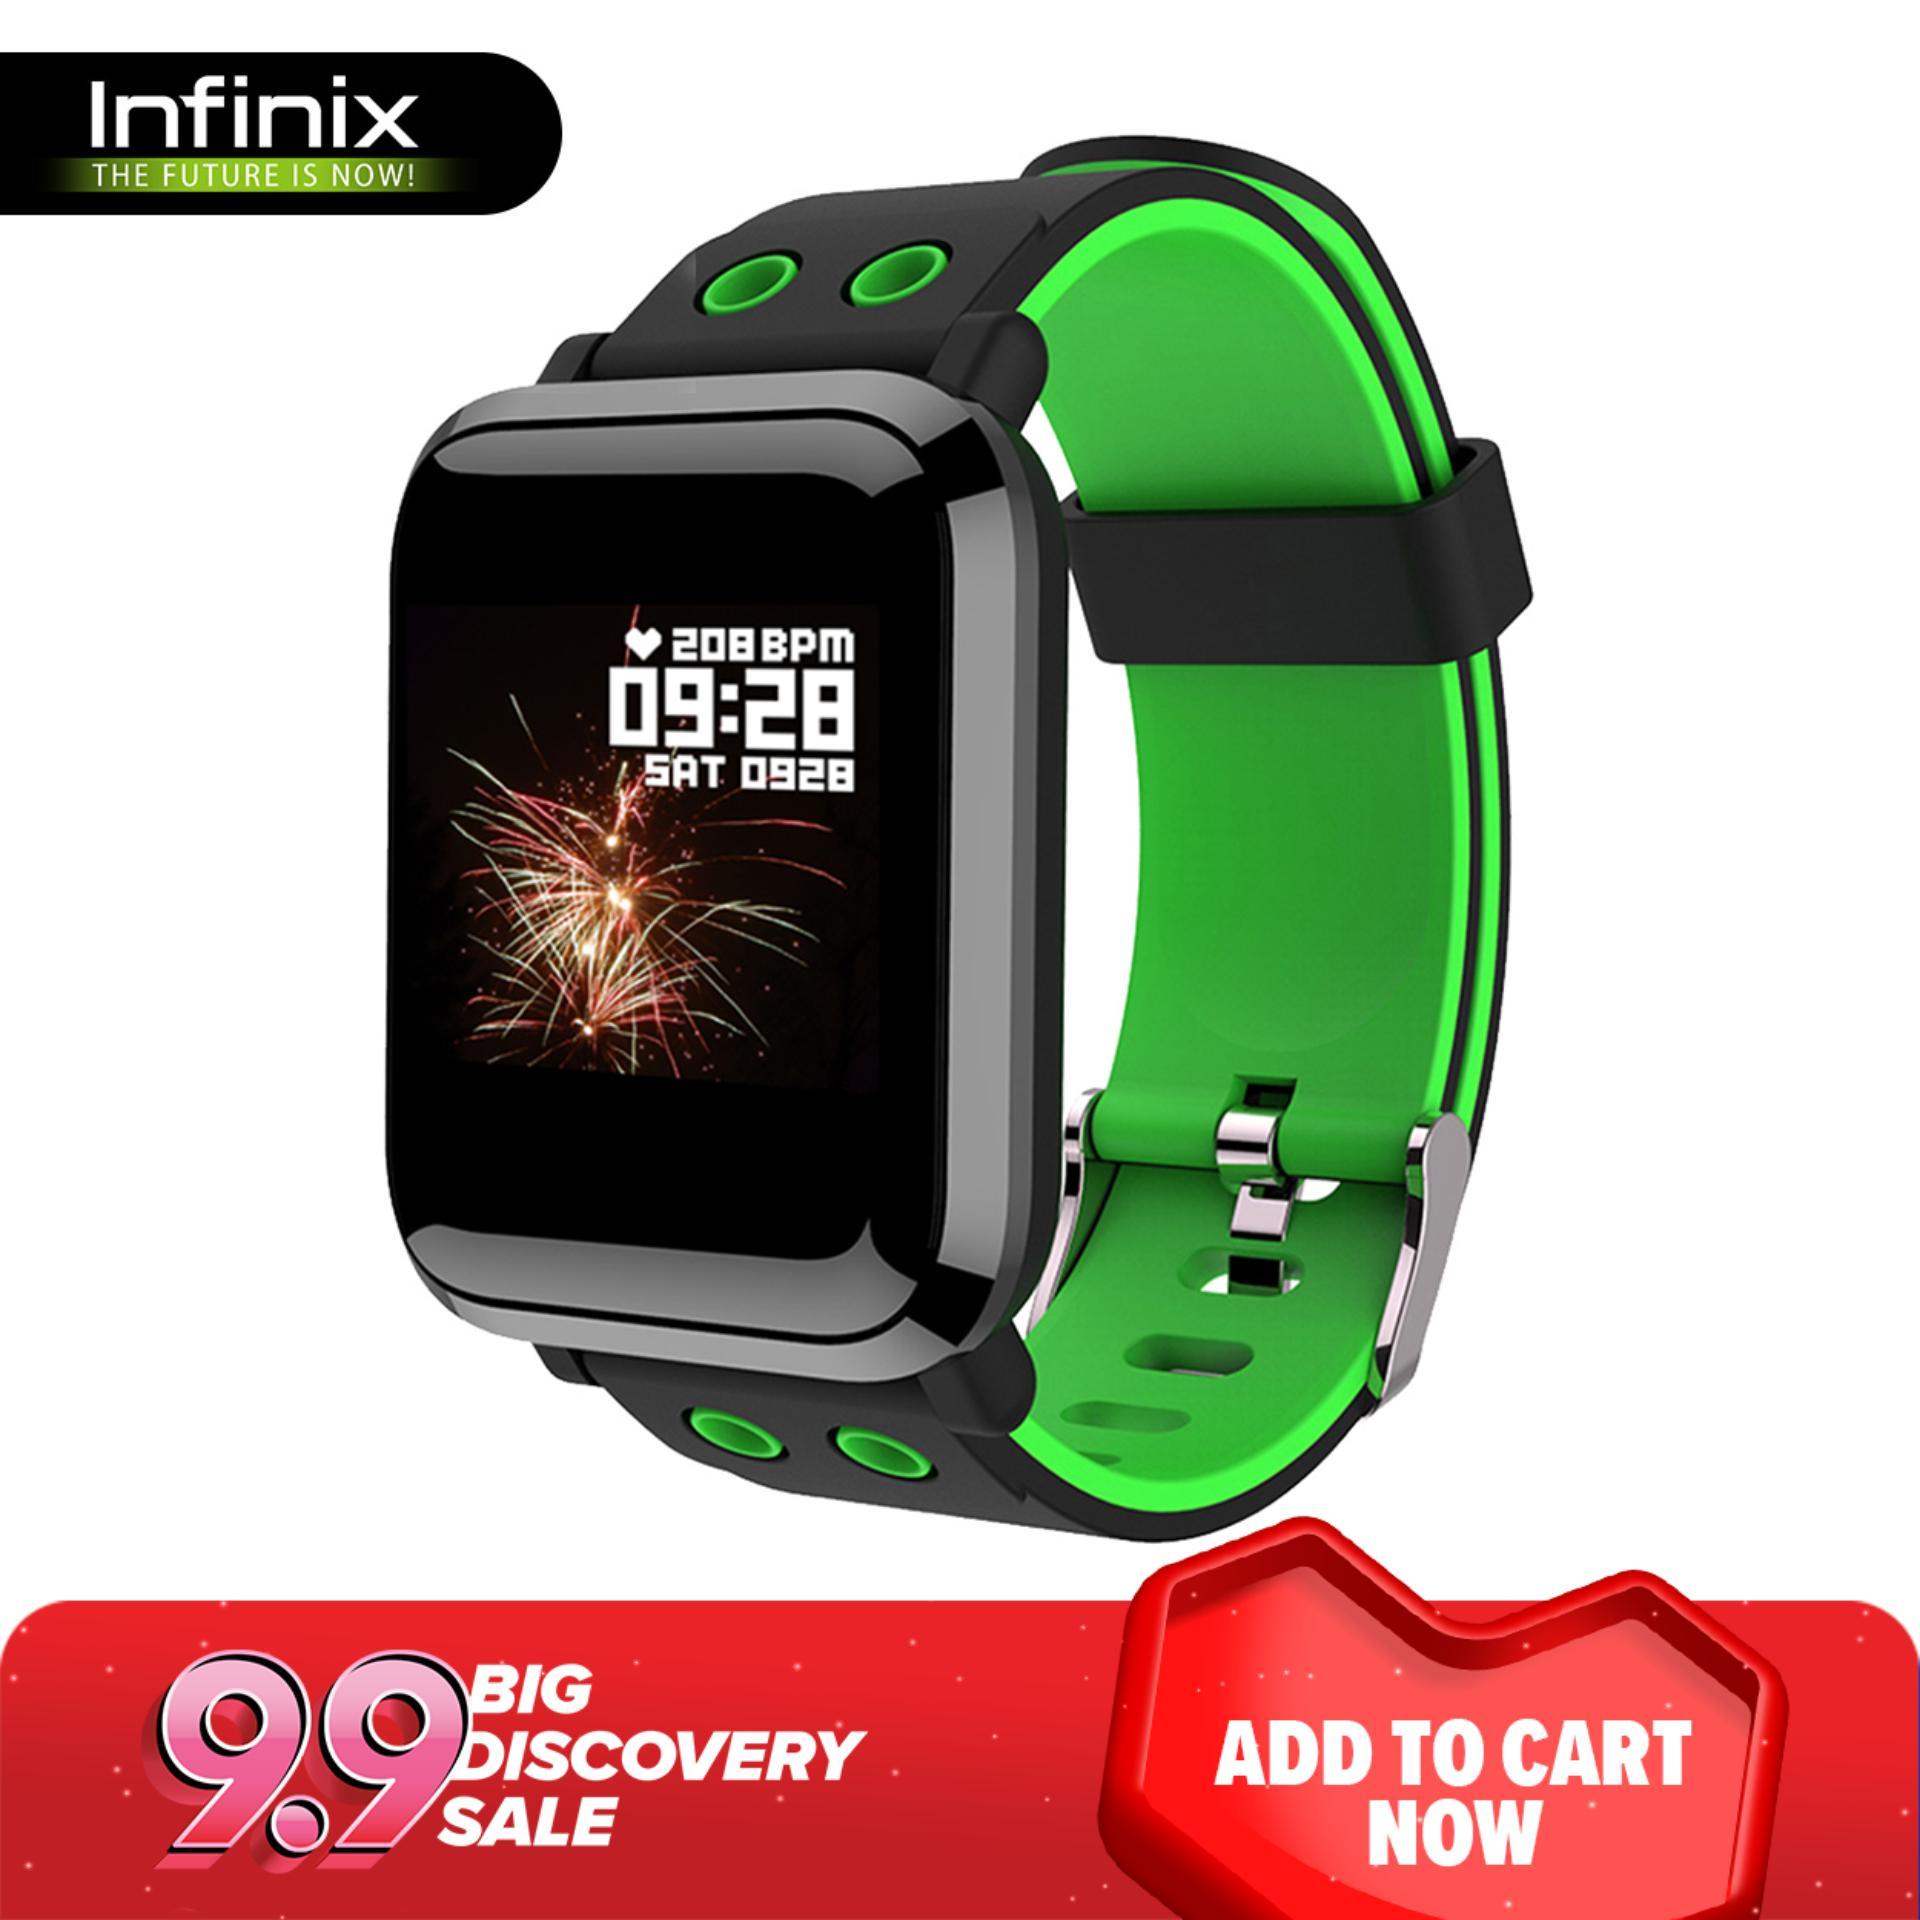 Infinix XW01 Heart-Rate Monitor Fitness Smart Watch (Black/Green)